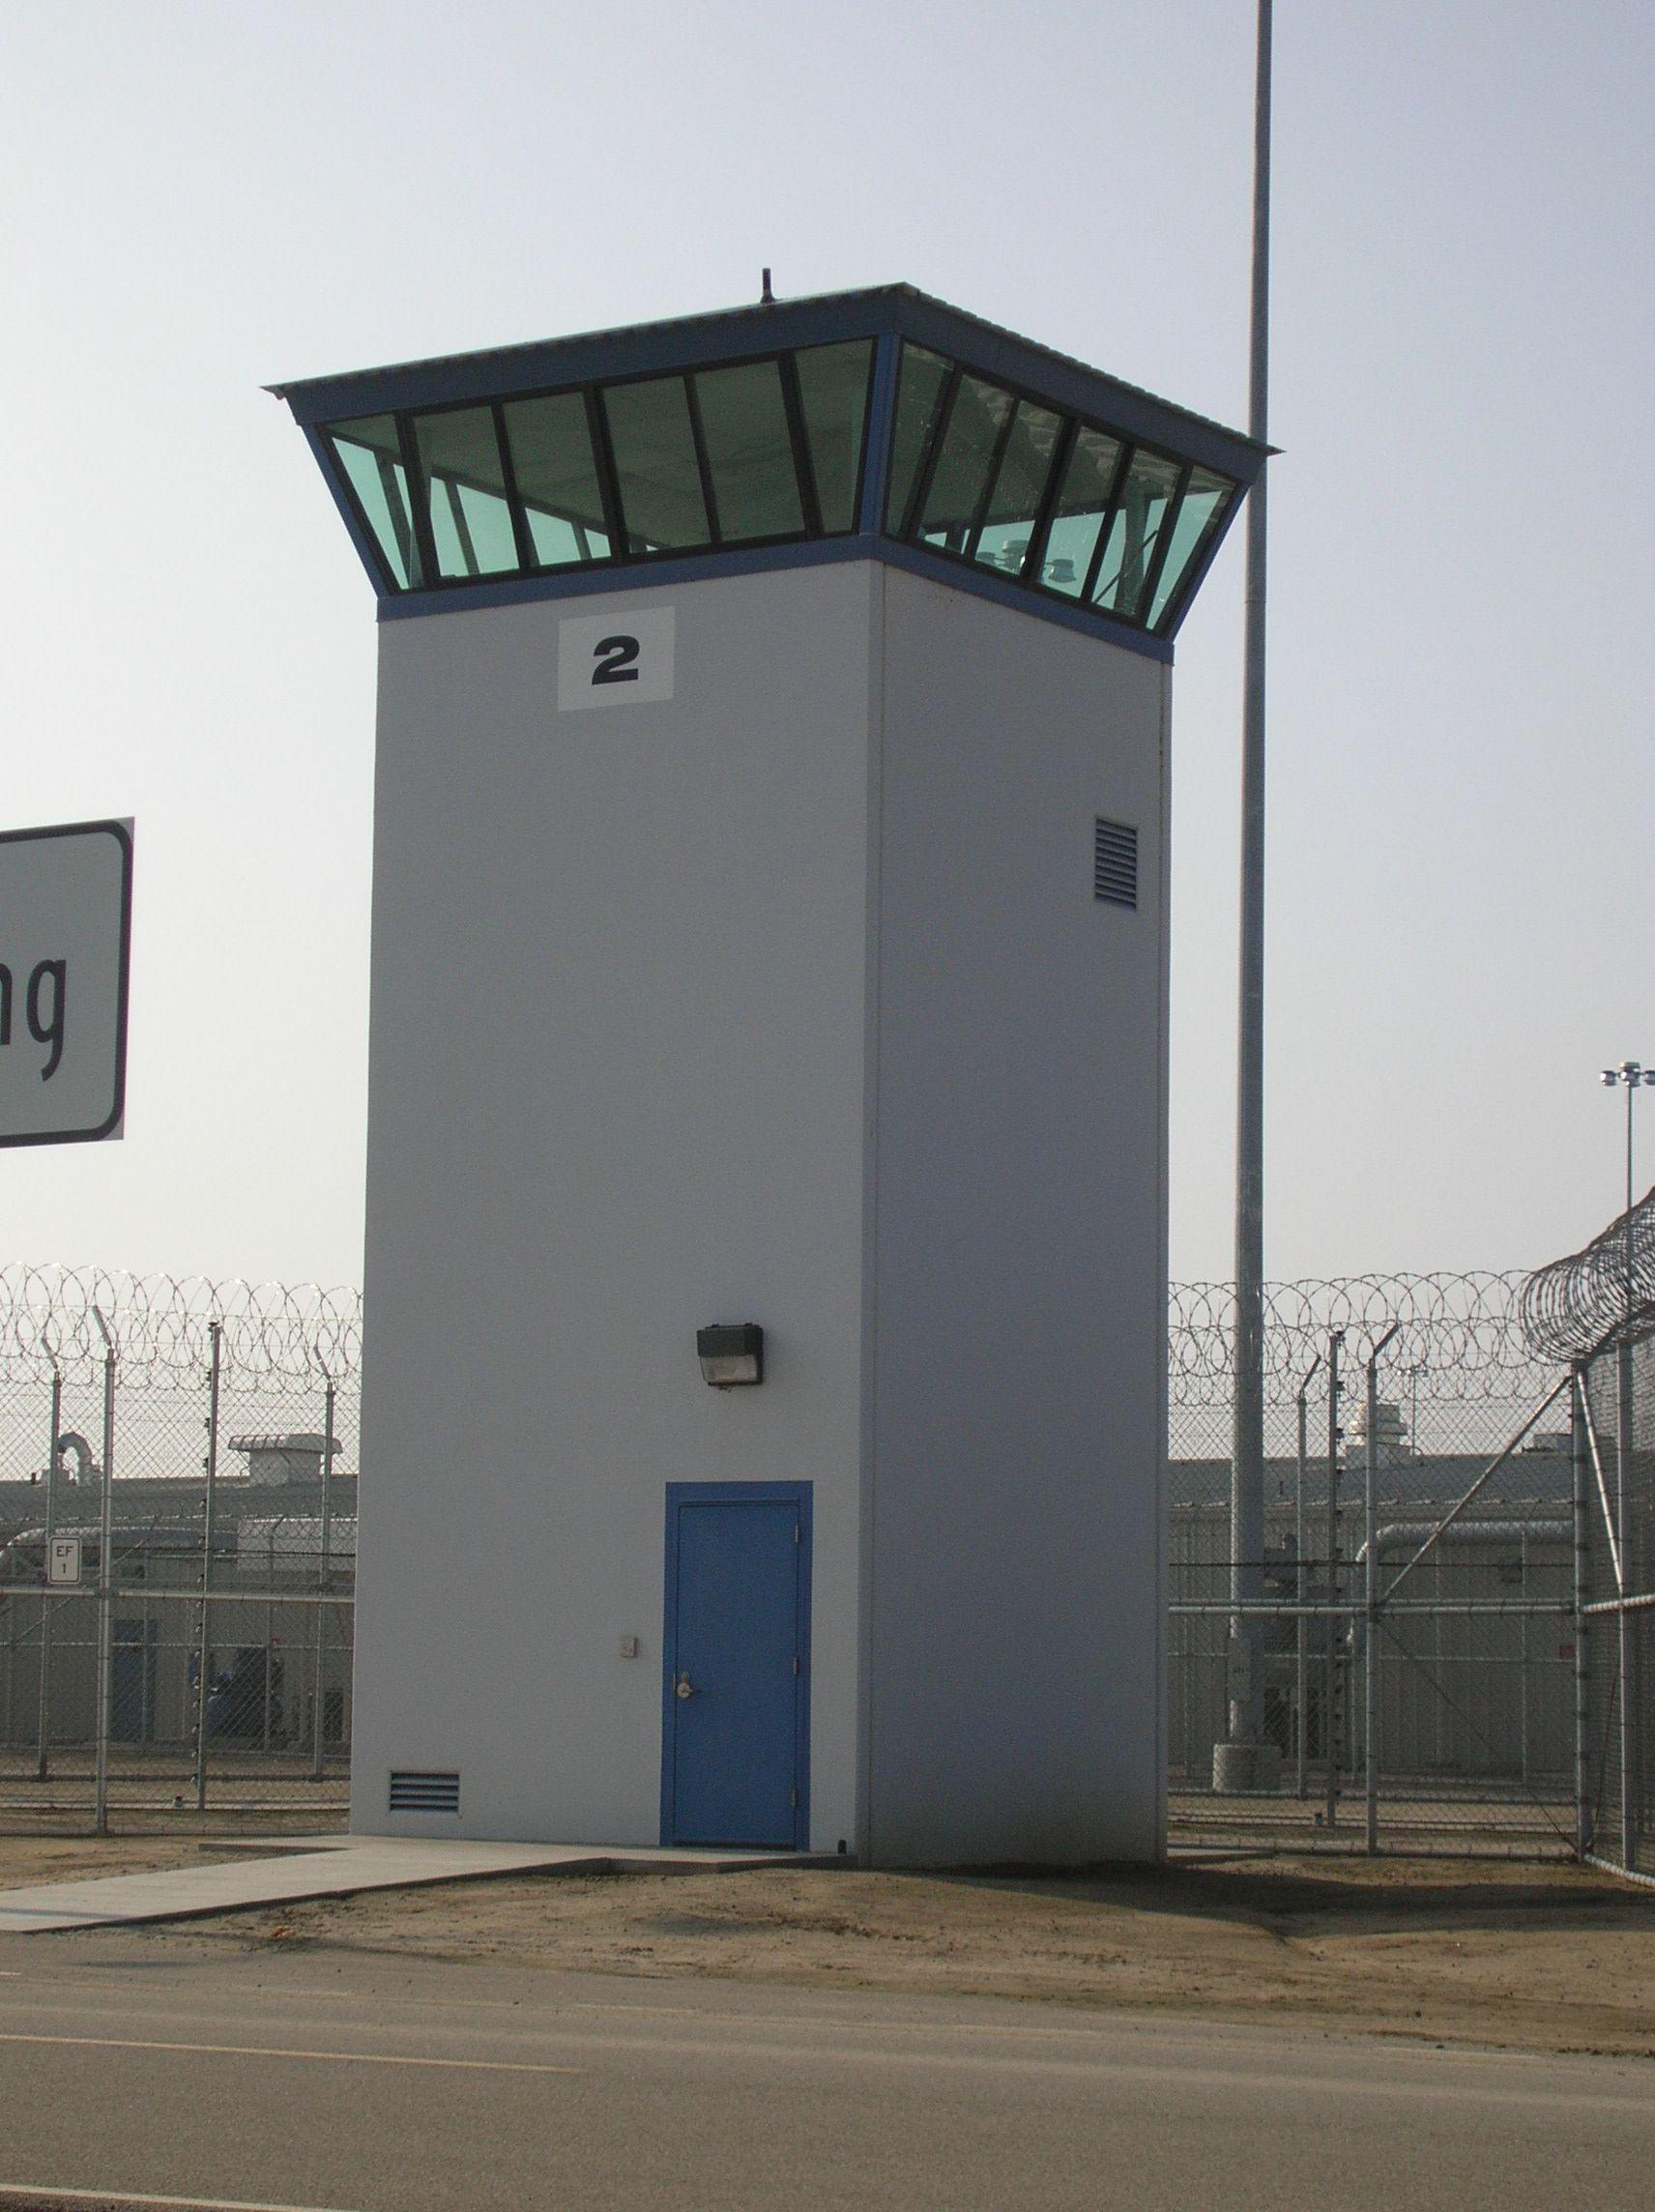 Modern Guard House Design: Image Result For Modern Prison Tower